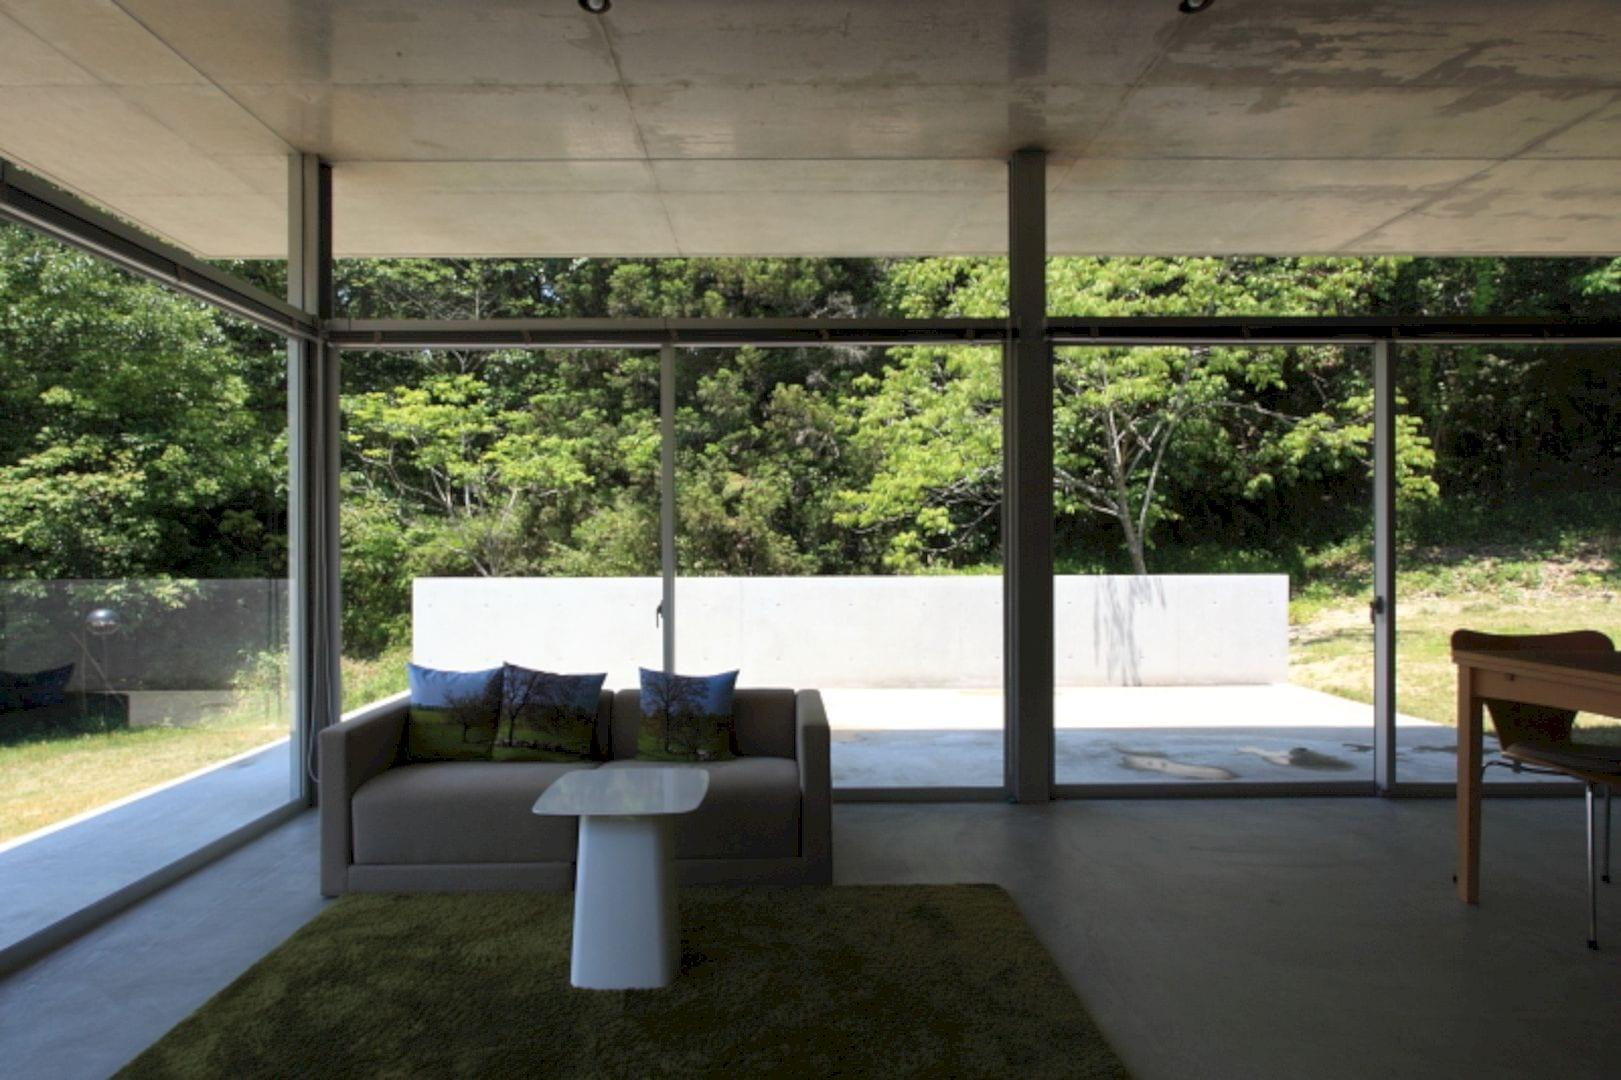 House In Ibara By Kazunori Fujimoto Architects 5